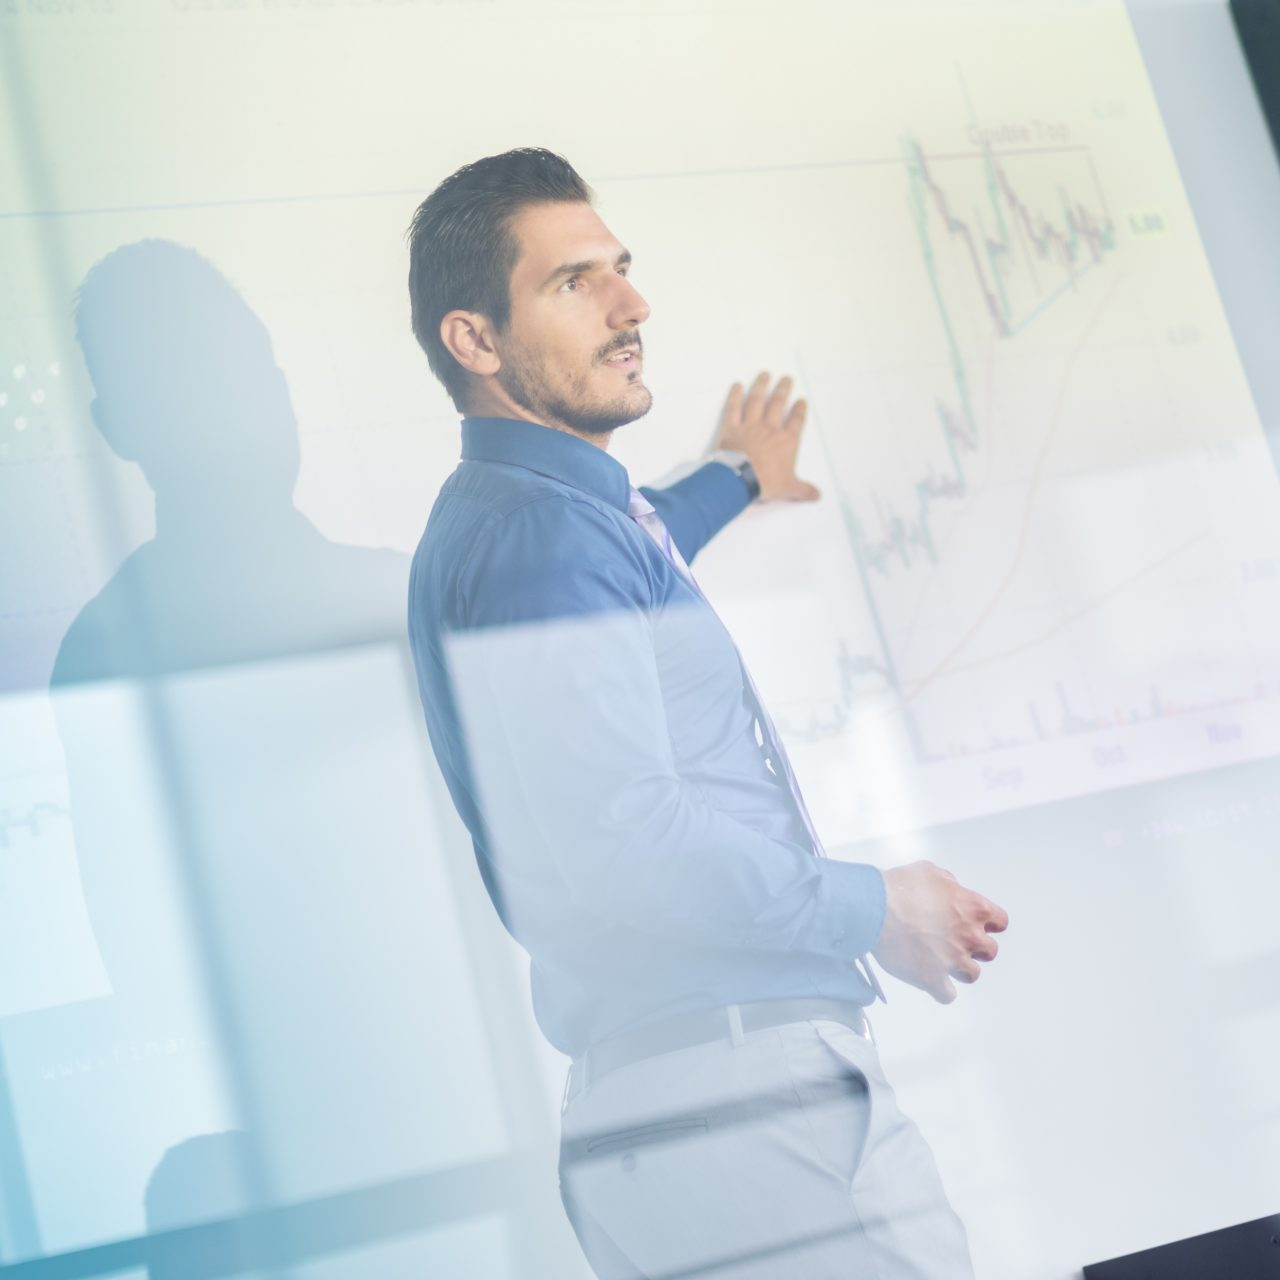 Executive presenter training & coaching